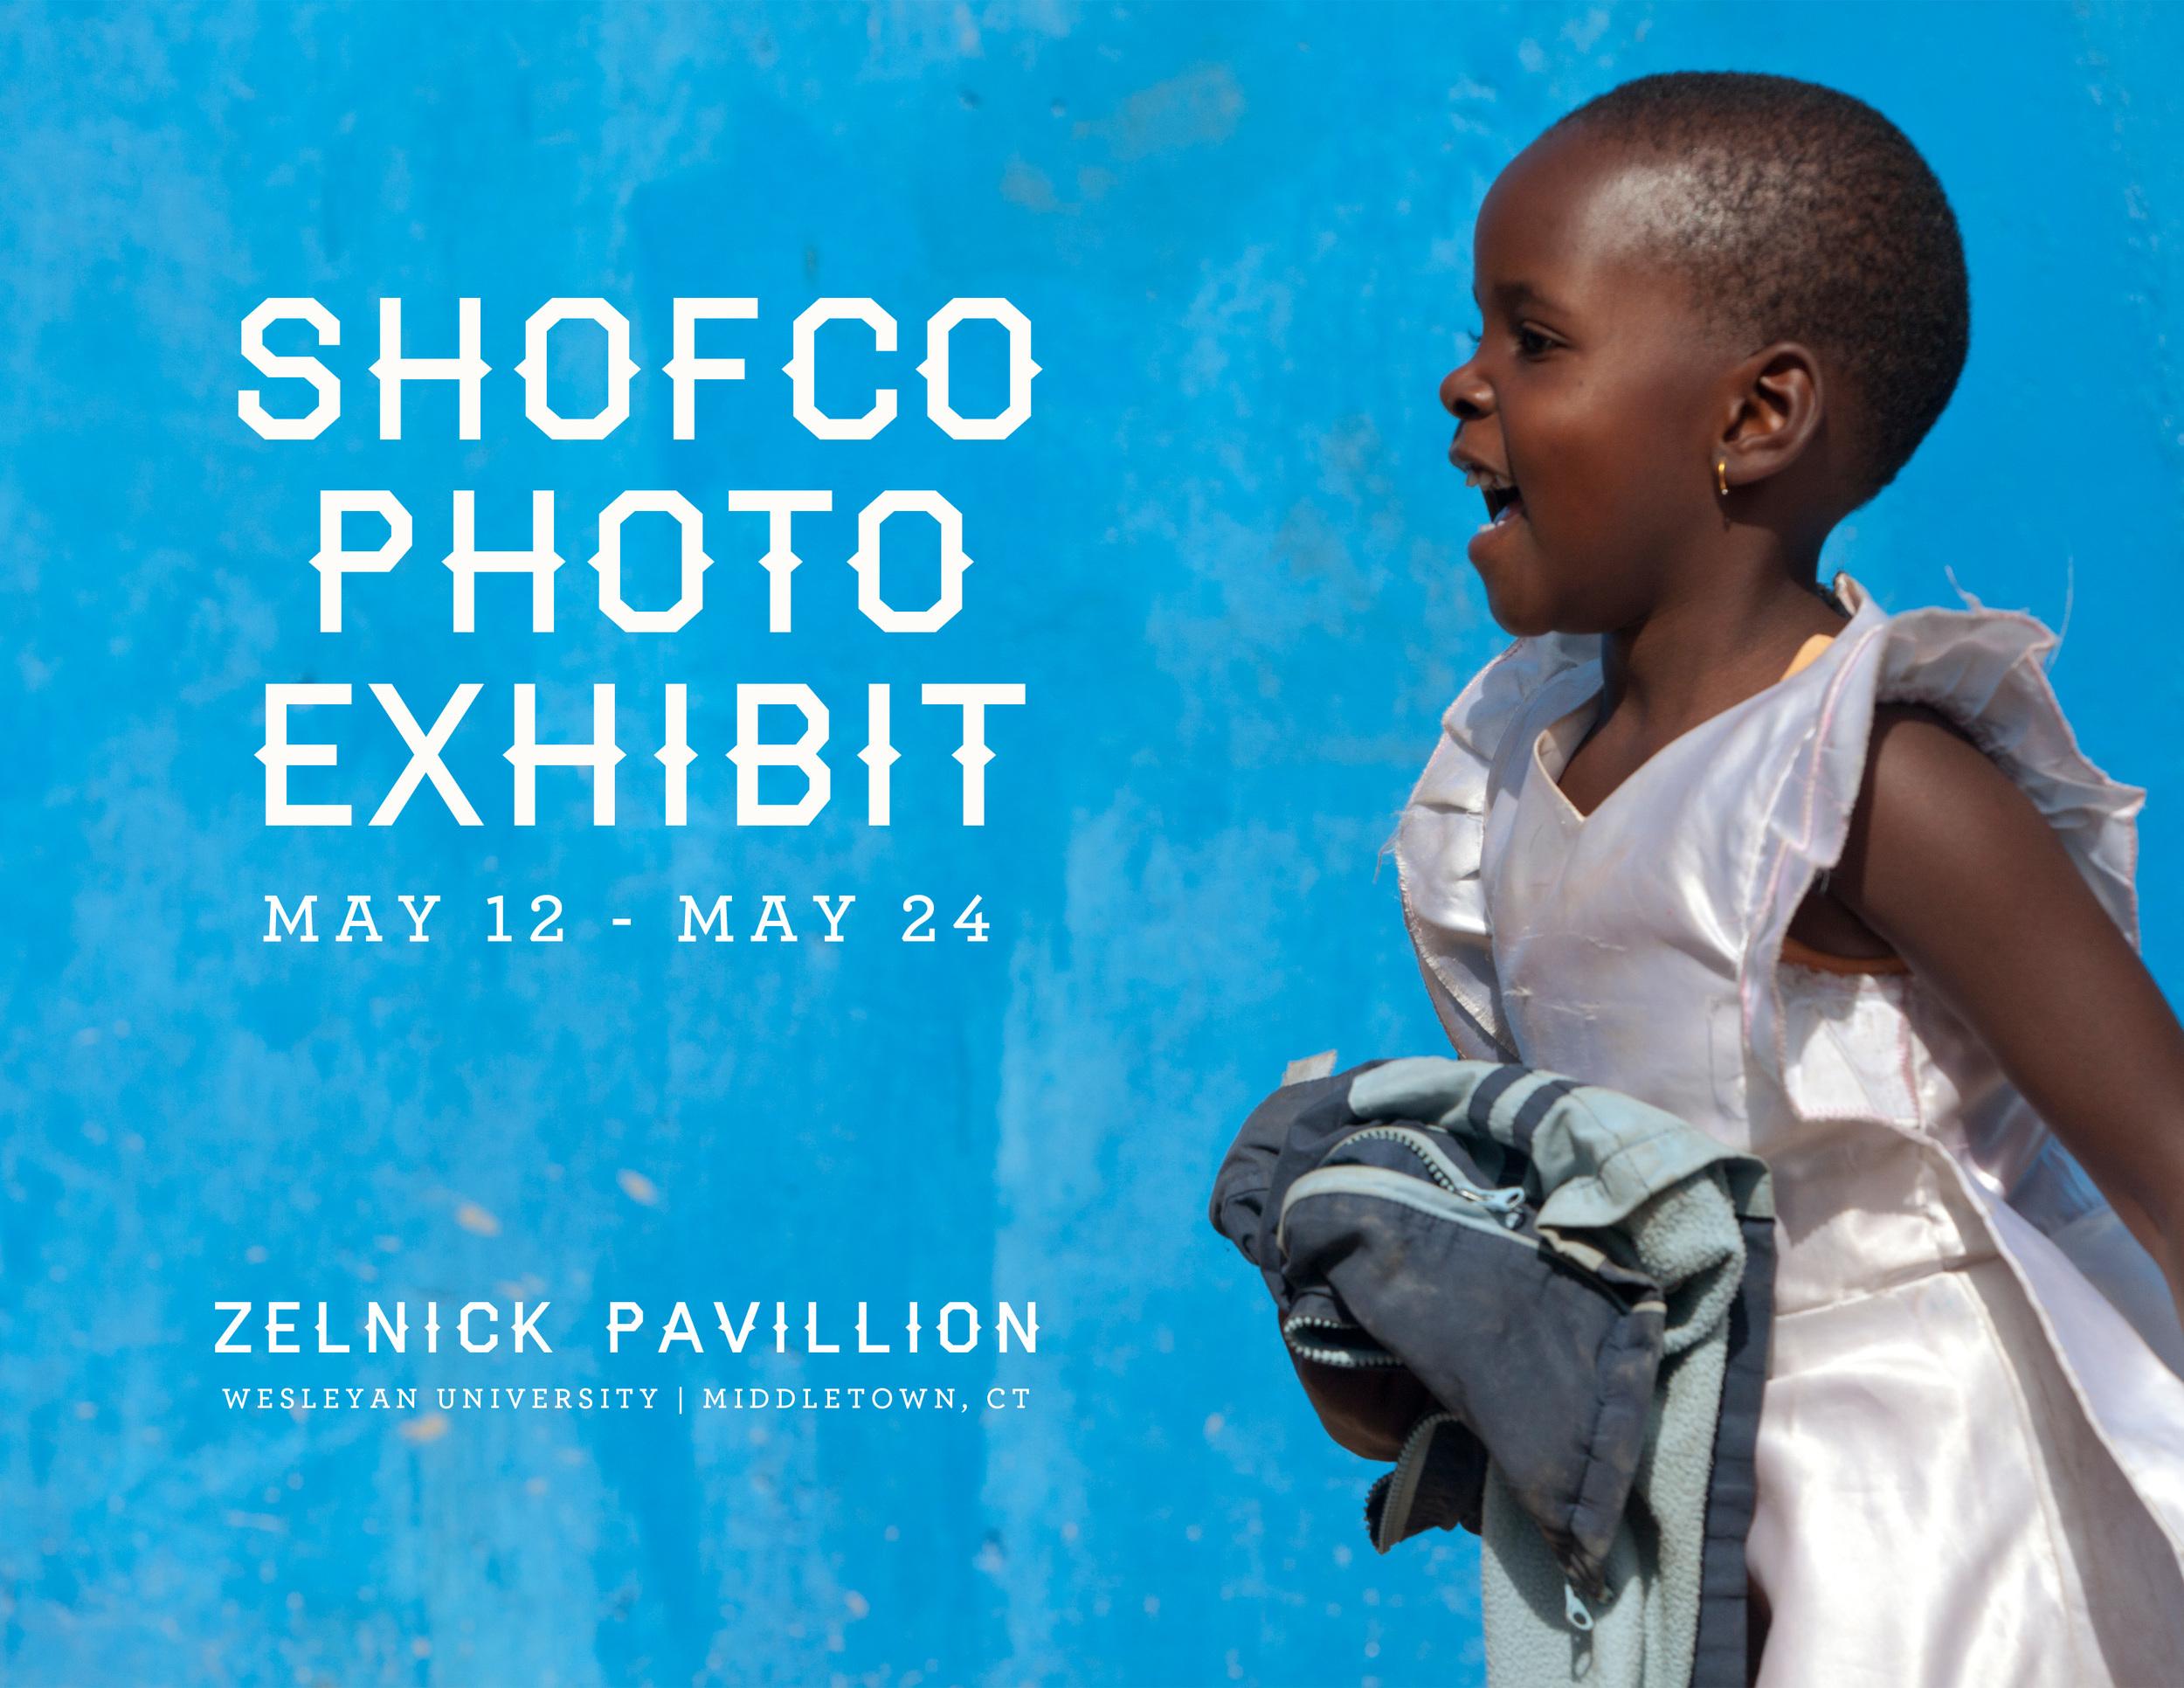 Shofco Photo Exhibit Poster.jpg